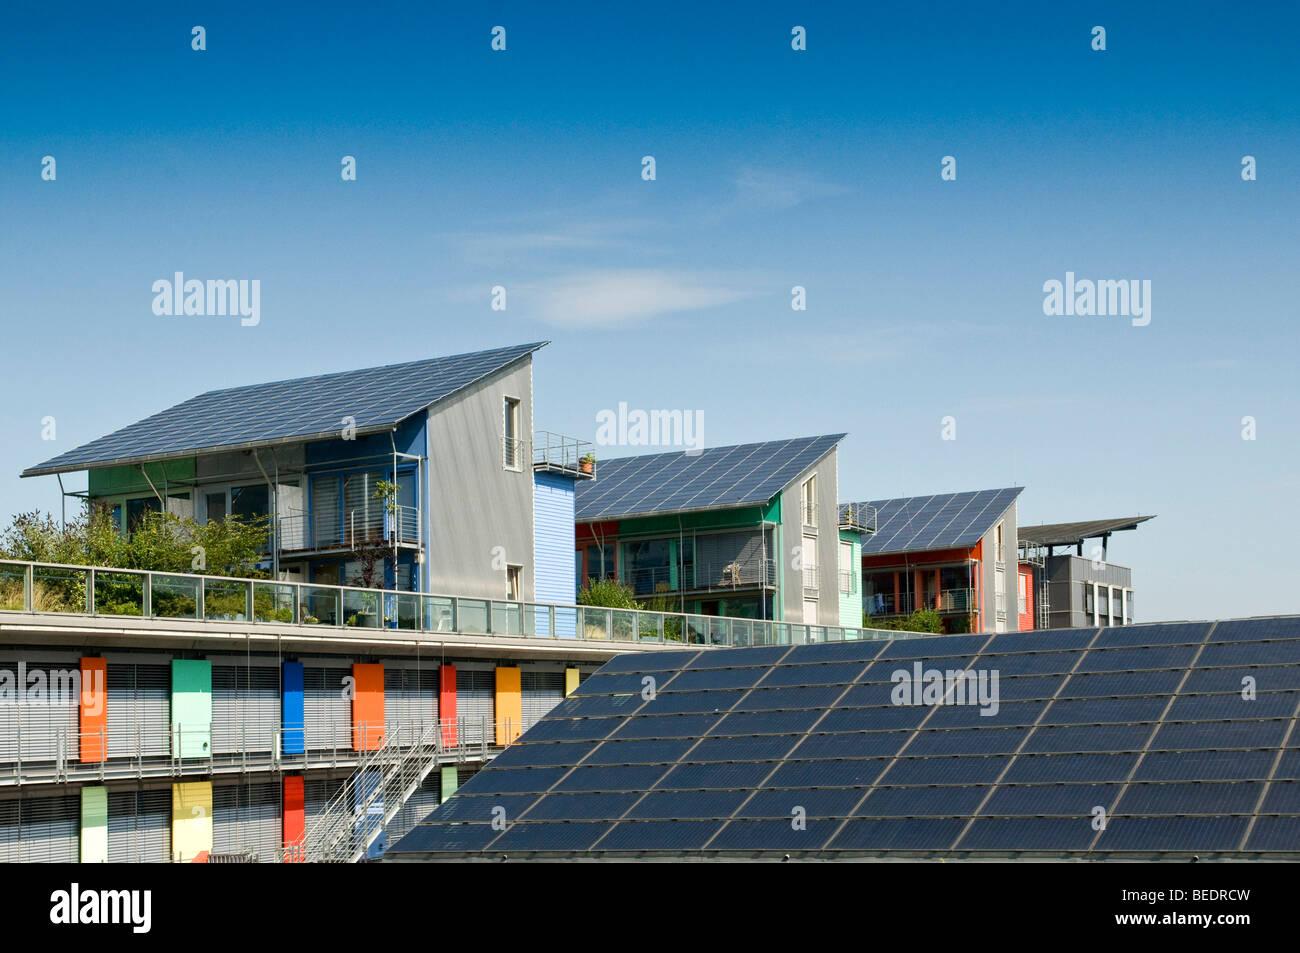 solar village vauban freiburg baden wuerttemberg germany europe stock photo 26119321 alamy. Black Bedroom Furniture Sets. Home Design Ideas